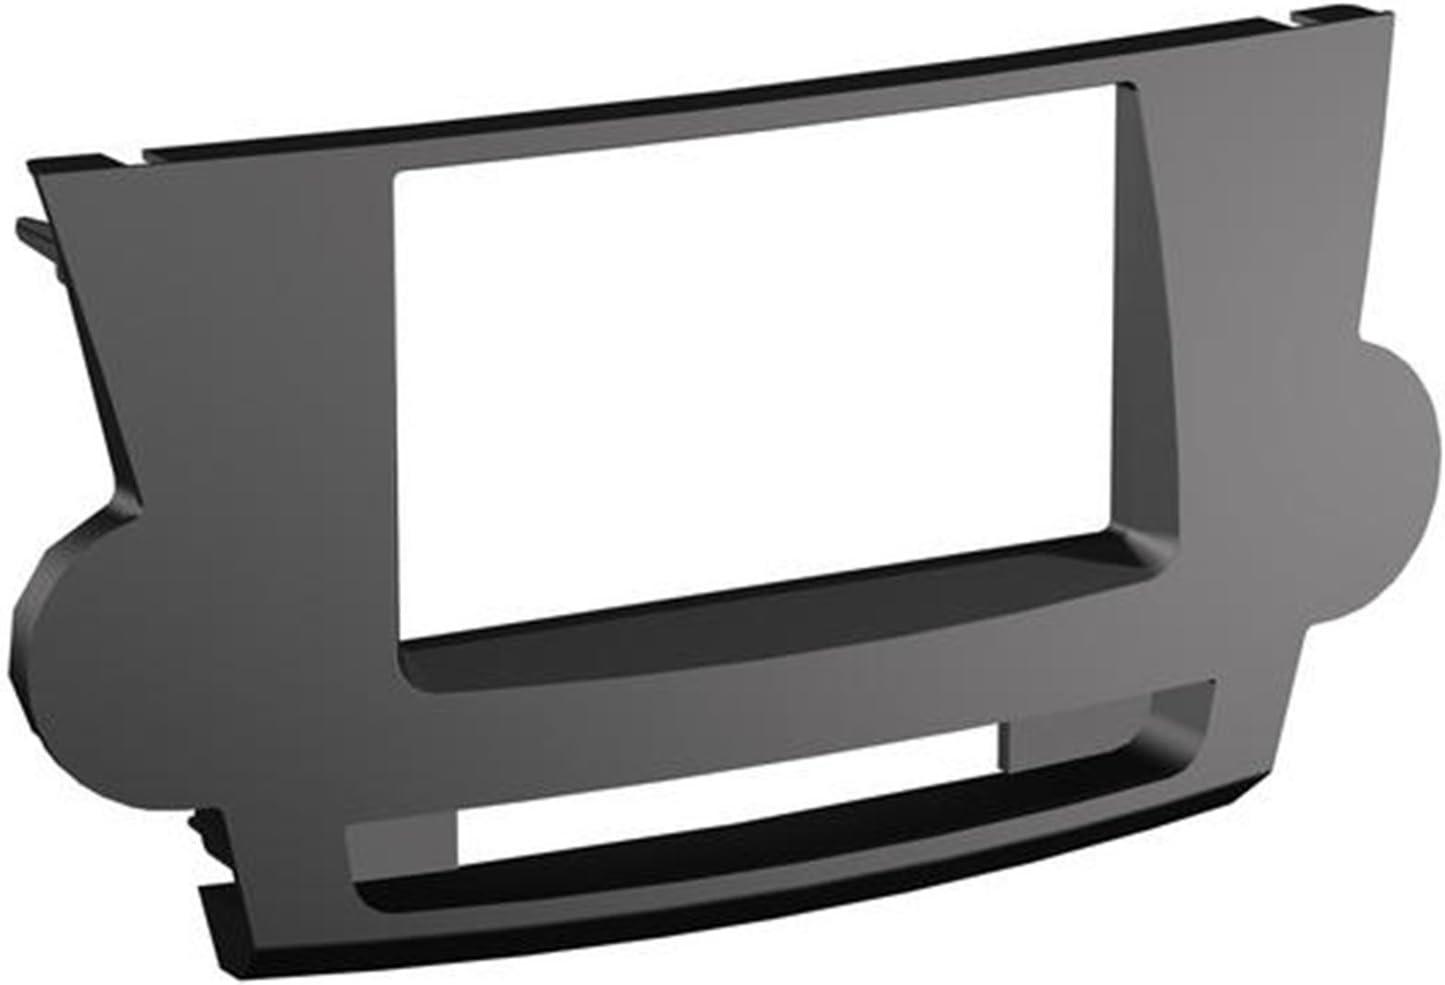 SCOSCHE TA2089B 2008-13 Toyota Highlander (Black) Double DIN or DIN w/Pocket Install Dash Kit